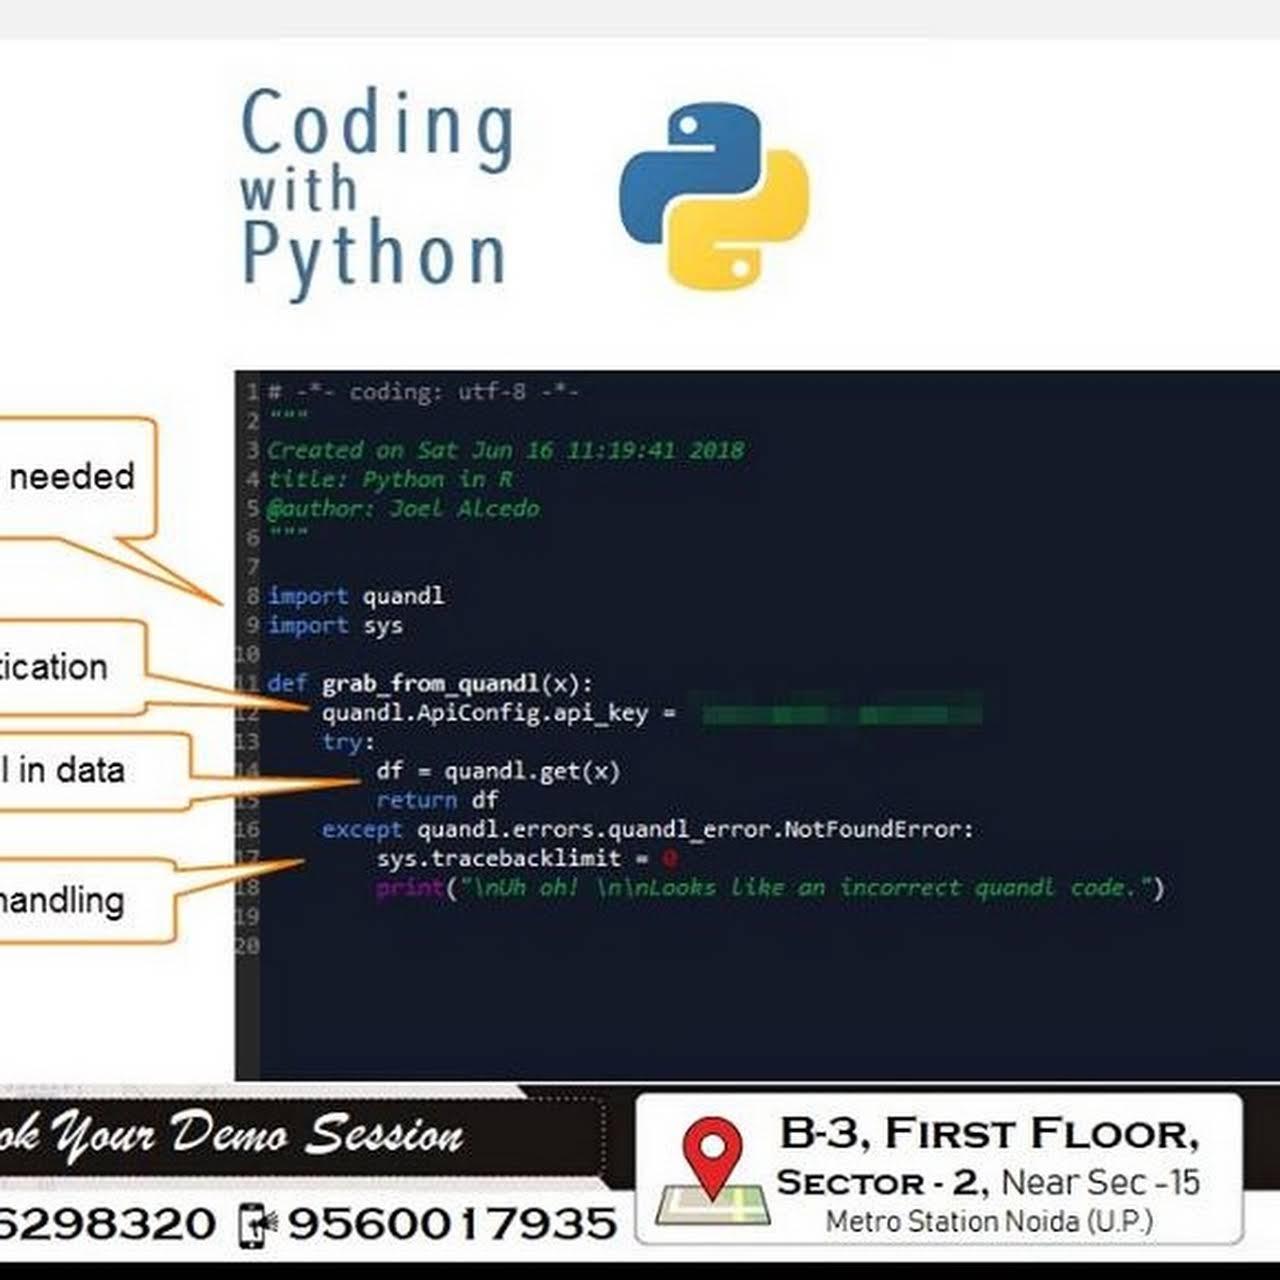 Python Training Institute in Noida | ITSparkDS - Training Centre in